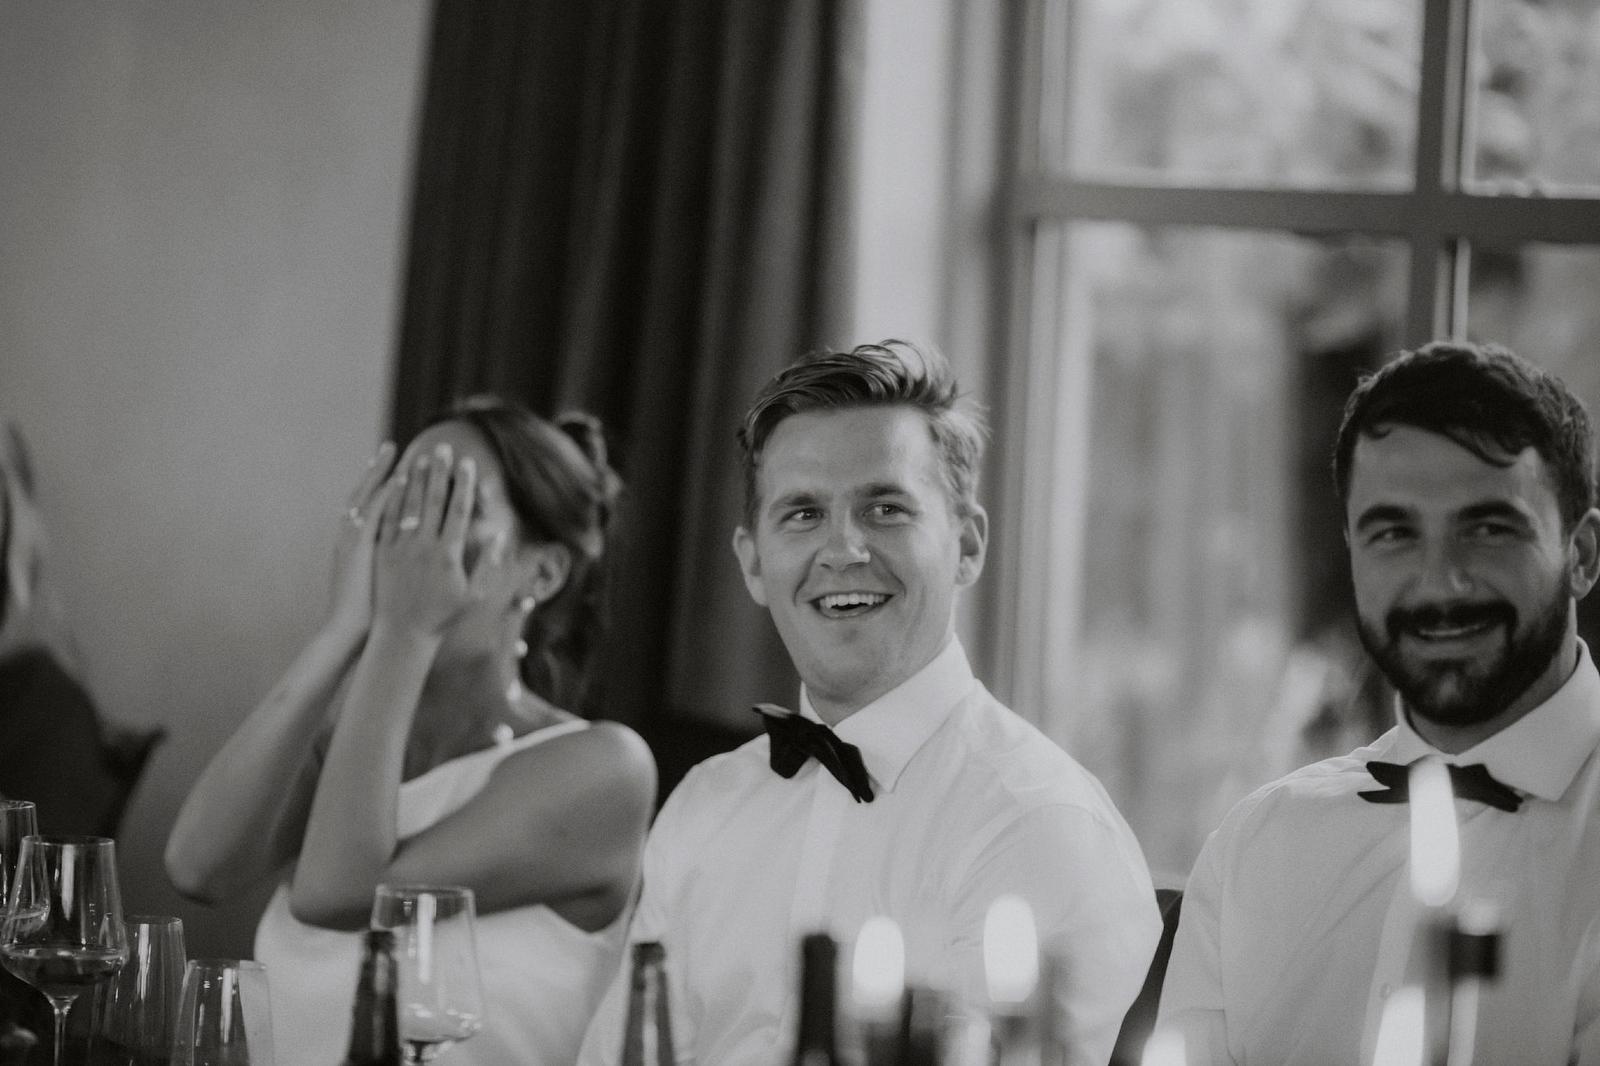 Alice and Dean's Wedding at Poppies in Martinborough, Wairarapa. Siaosi Photography.